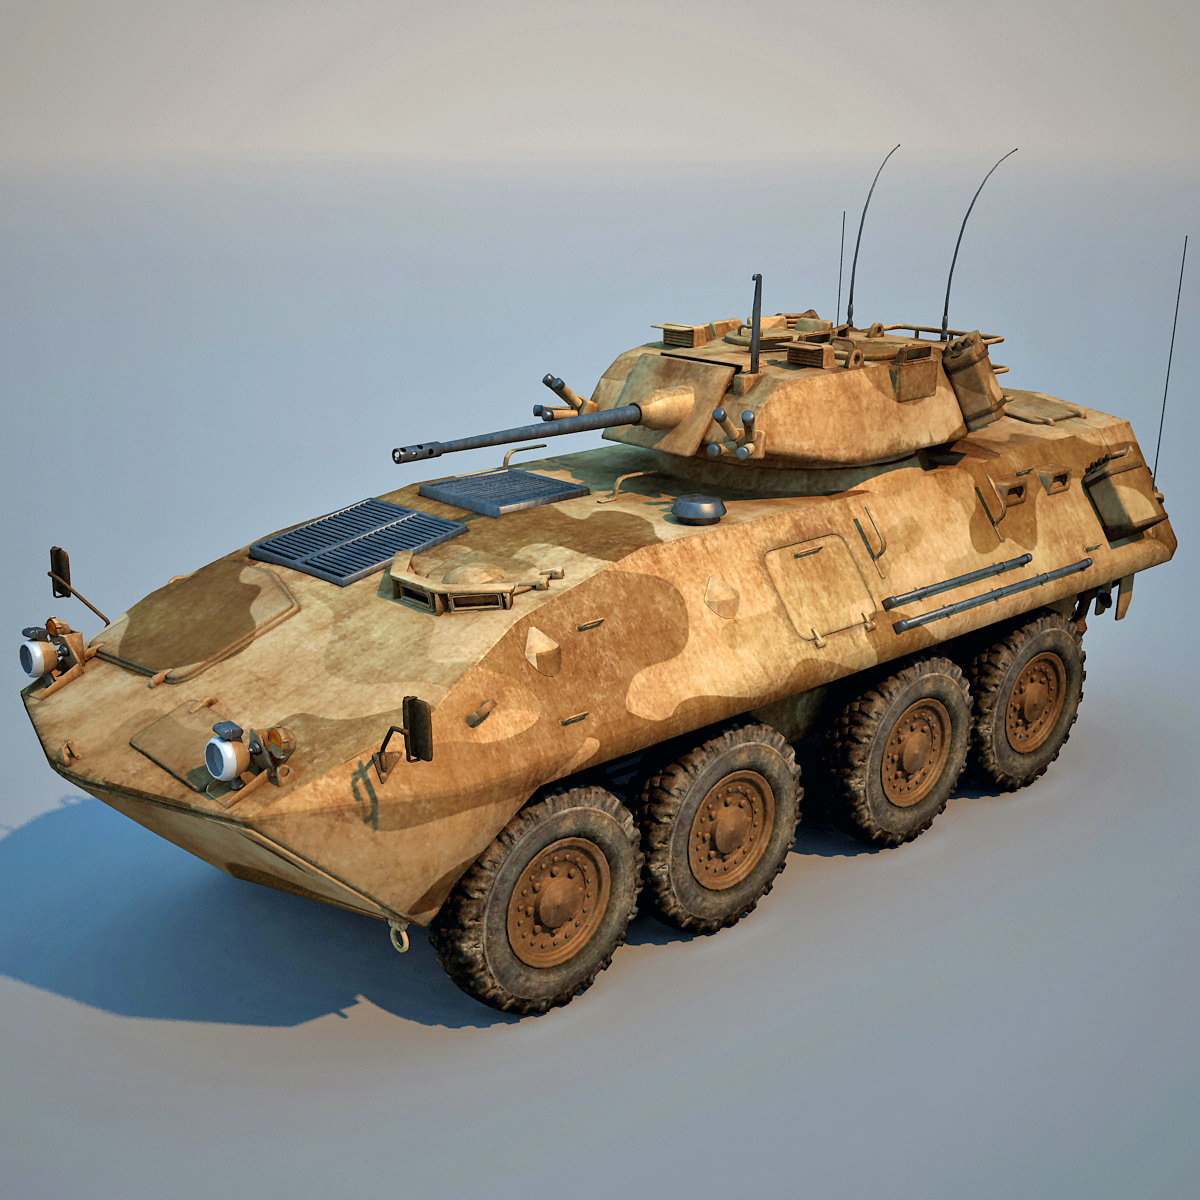 Lav_25_Amphibious_Vehicle_001.jpg